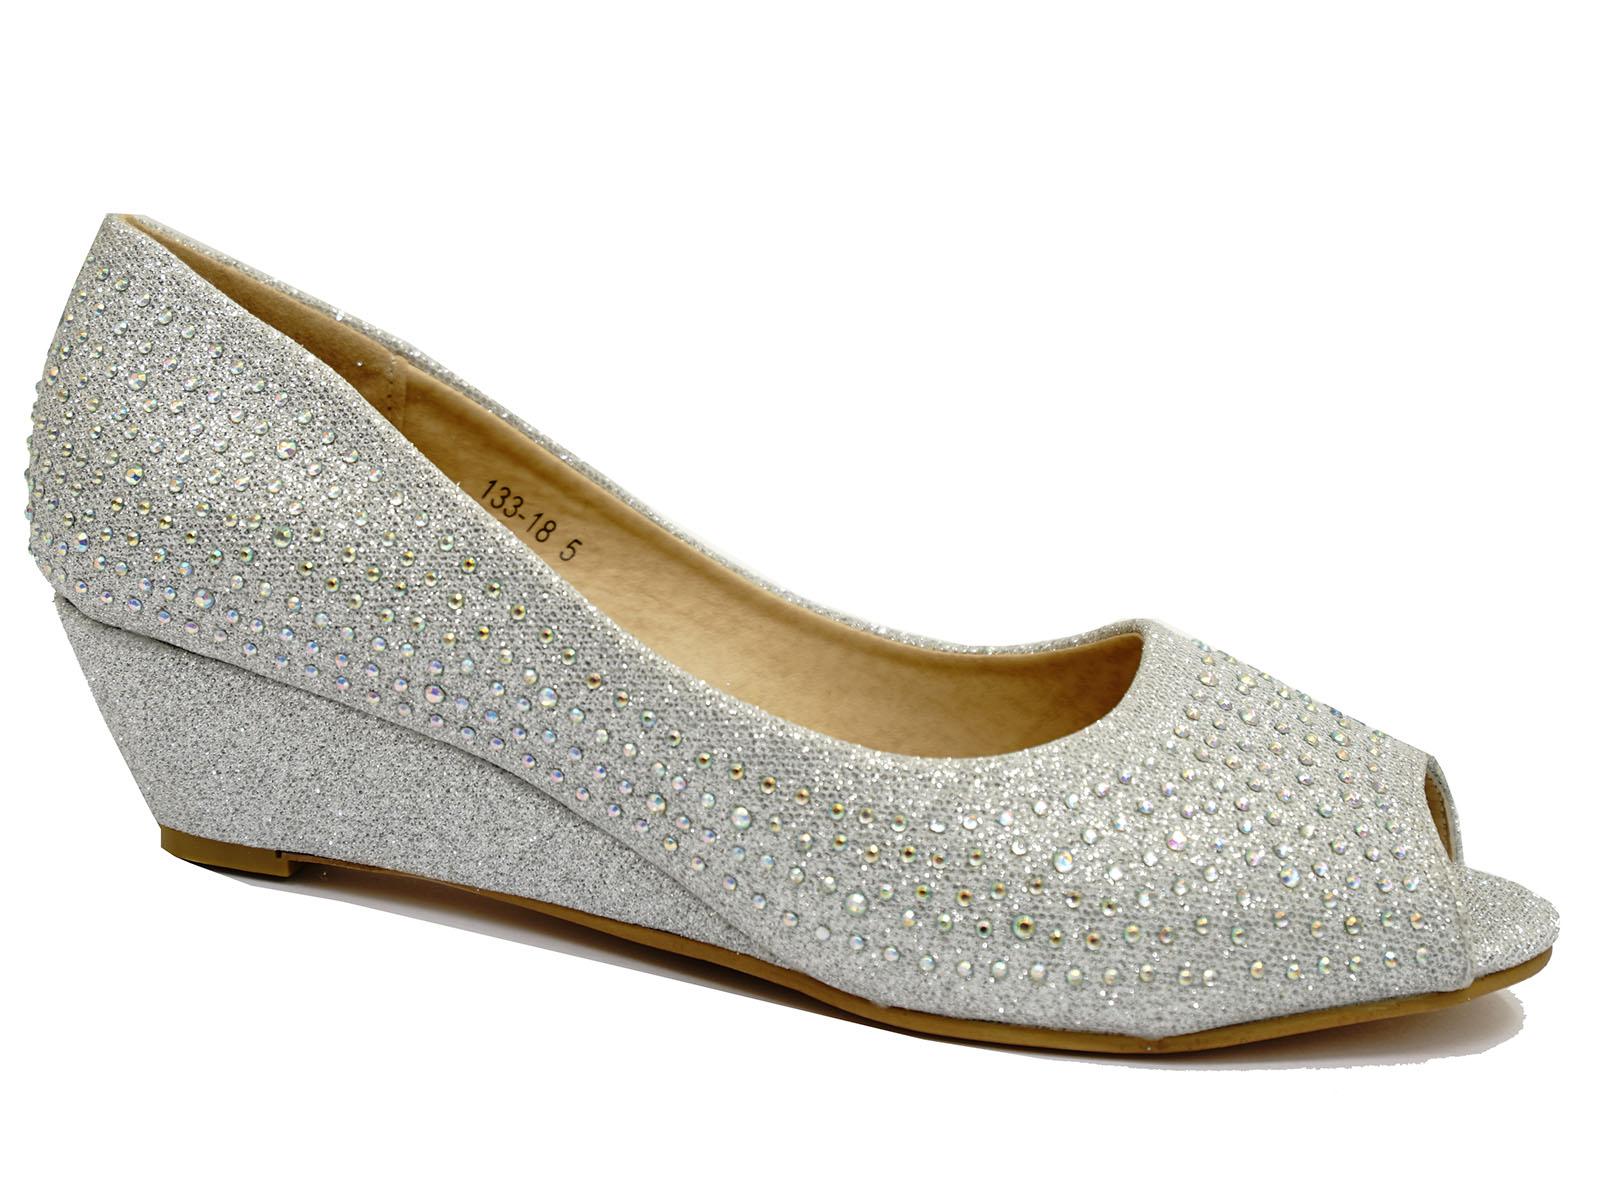 Wedge Heel Shoes For Wedding: WOMENS SILVER OPEN-TOE KITTEN-HEEL DIAMANTE LOW WEDGE